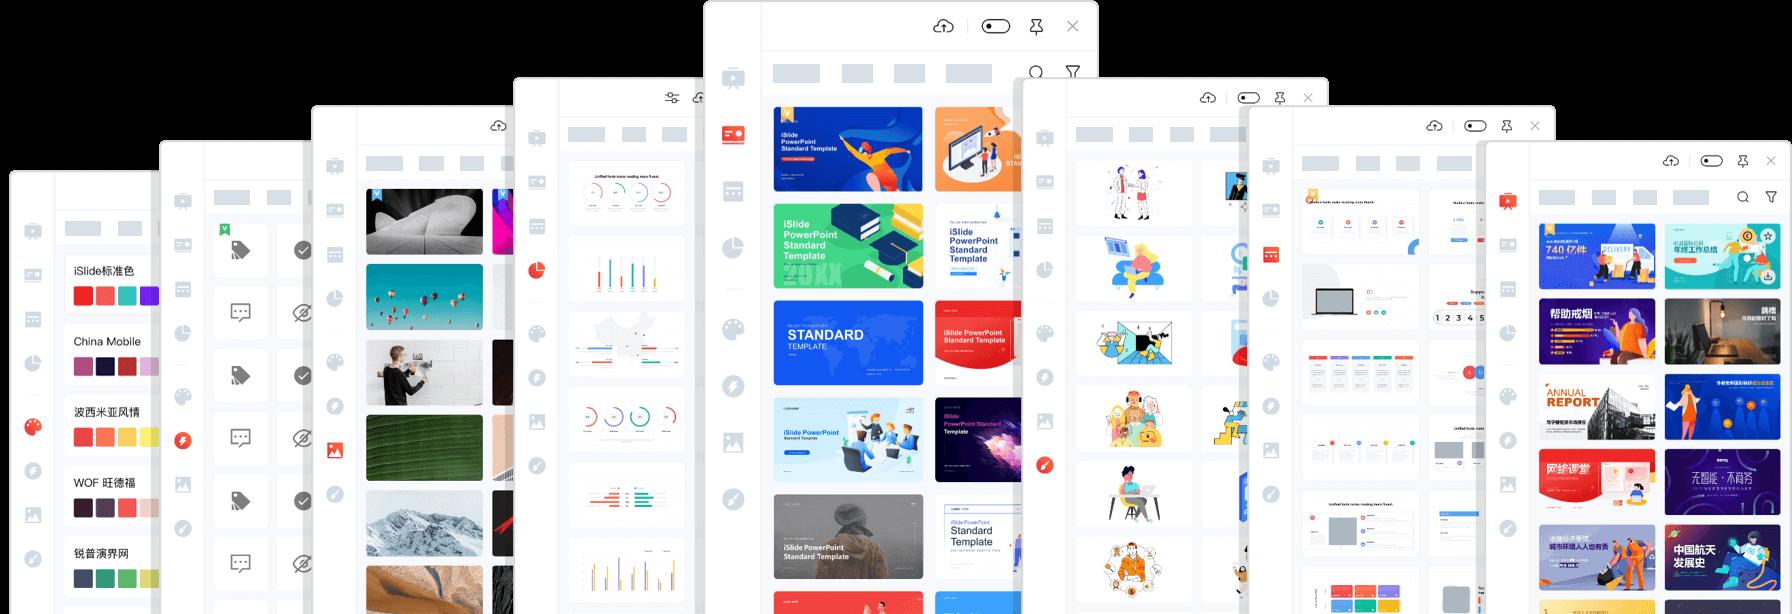 iSlide Screenshot